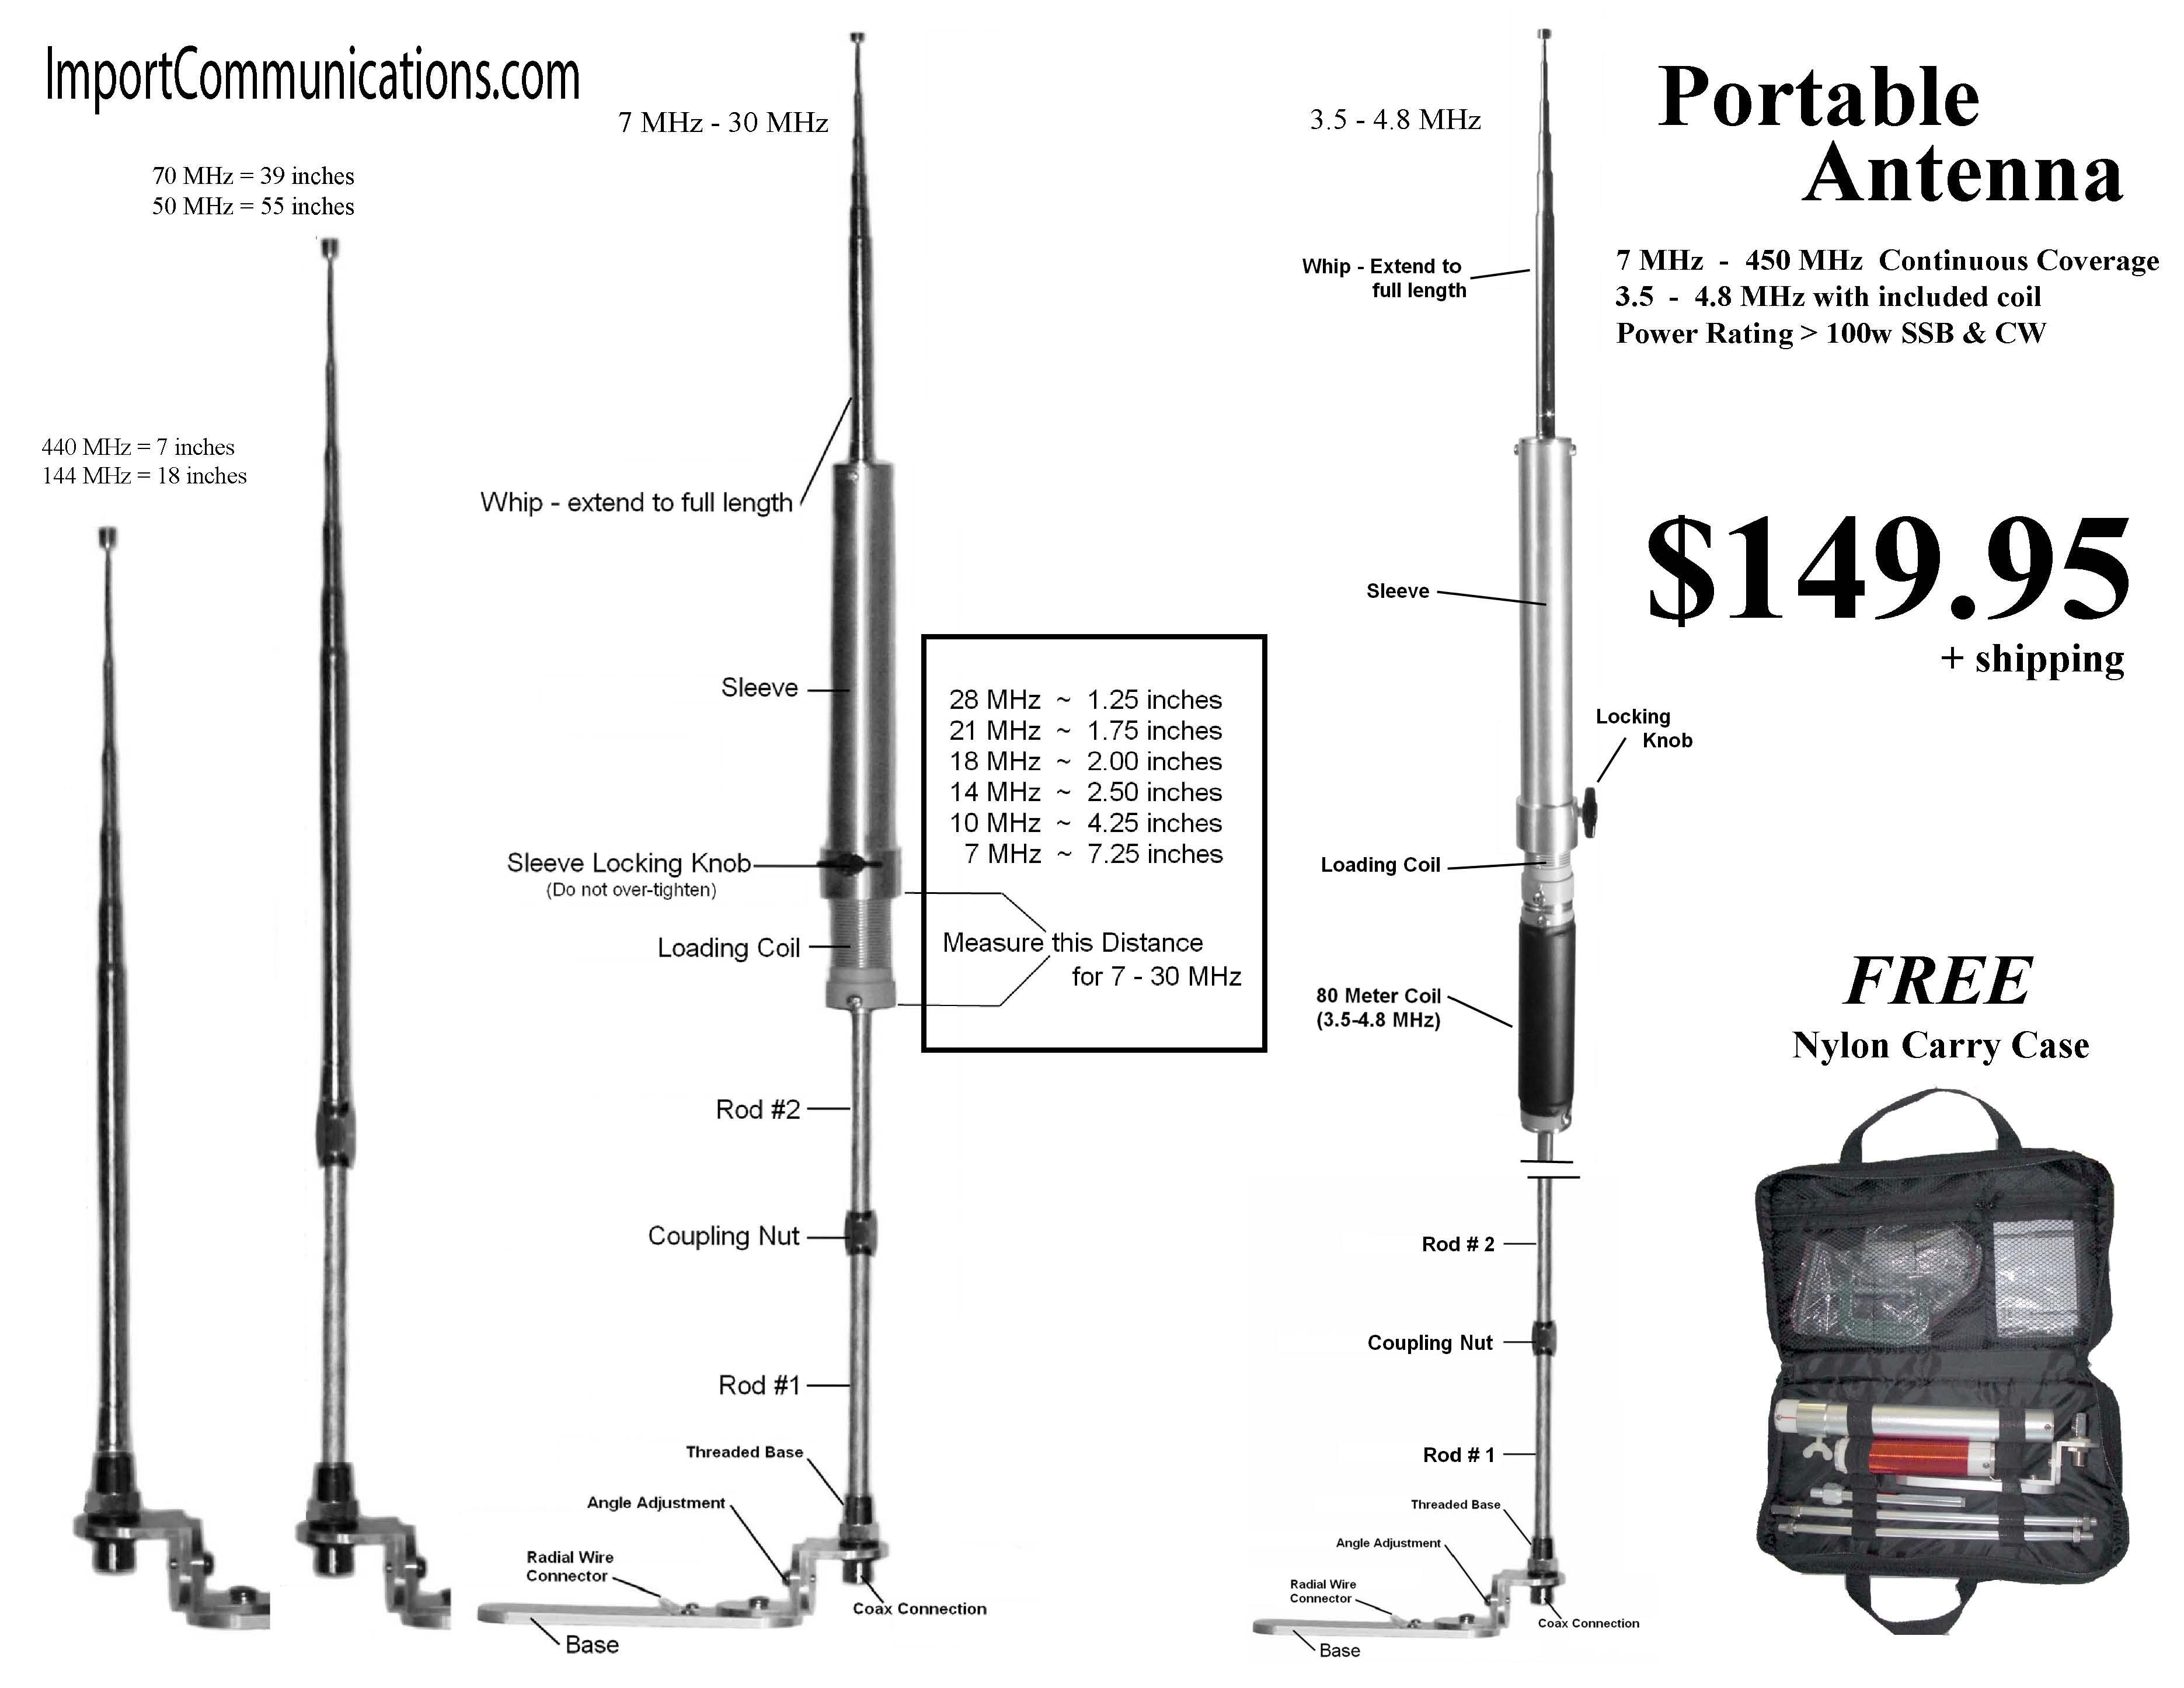 Portable All Band Antenna